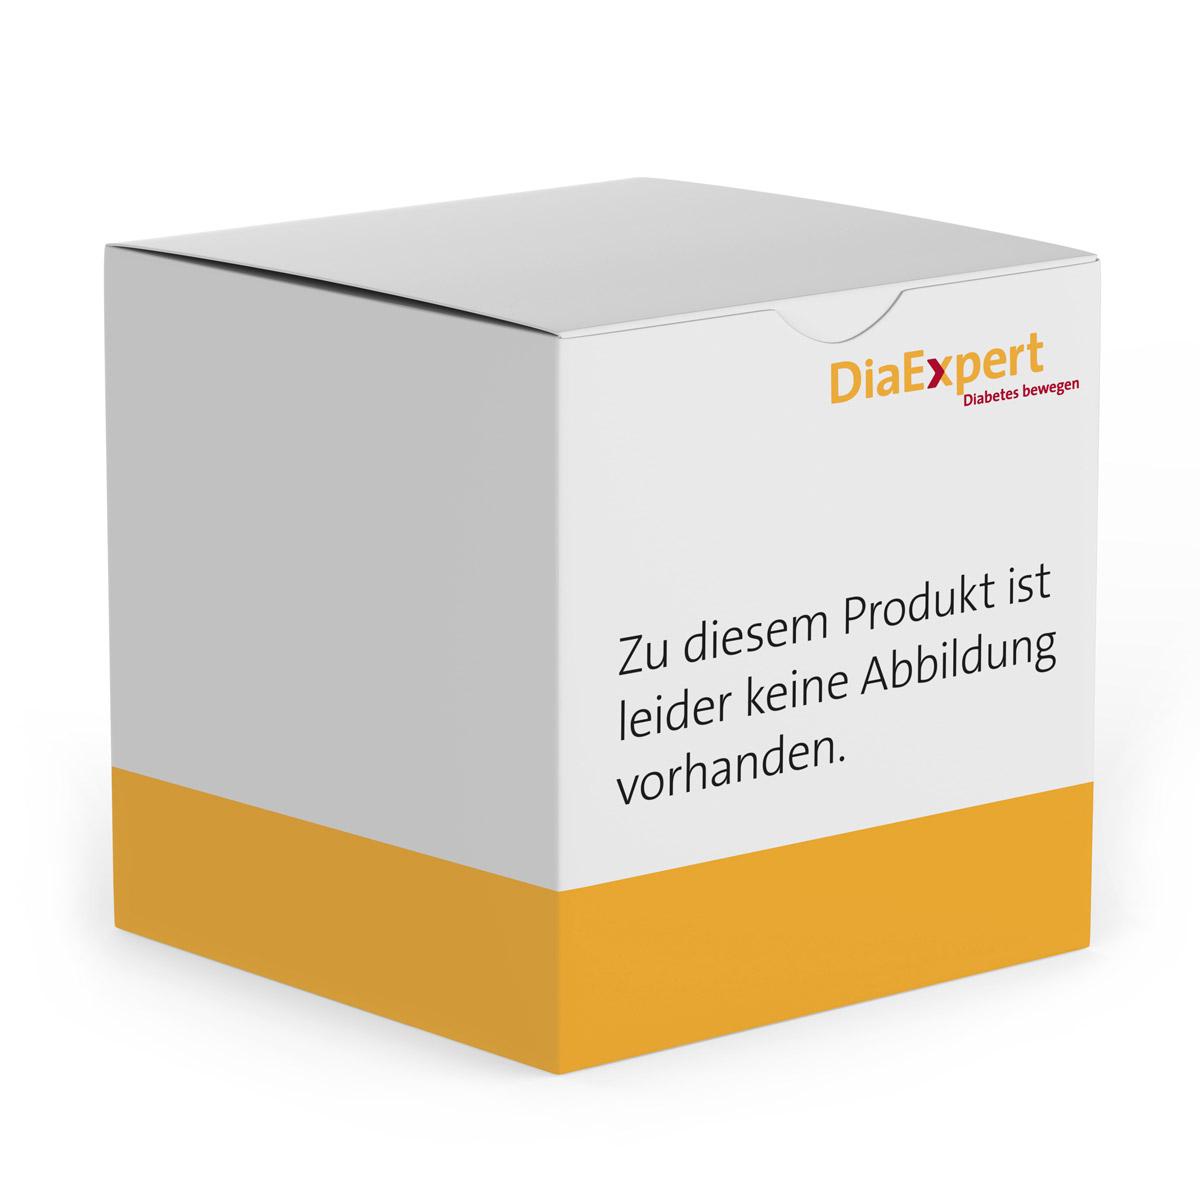 STADA Gluco Result Kontrollösung Level 3 3ml